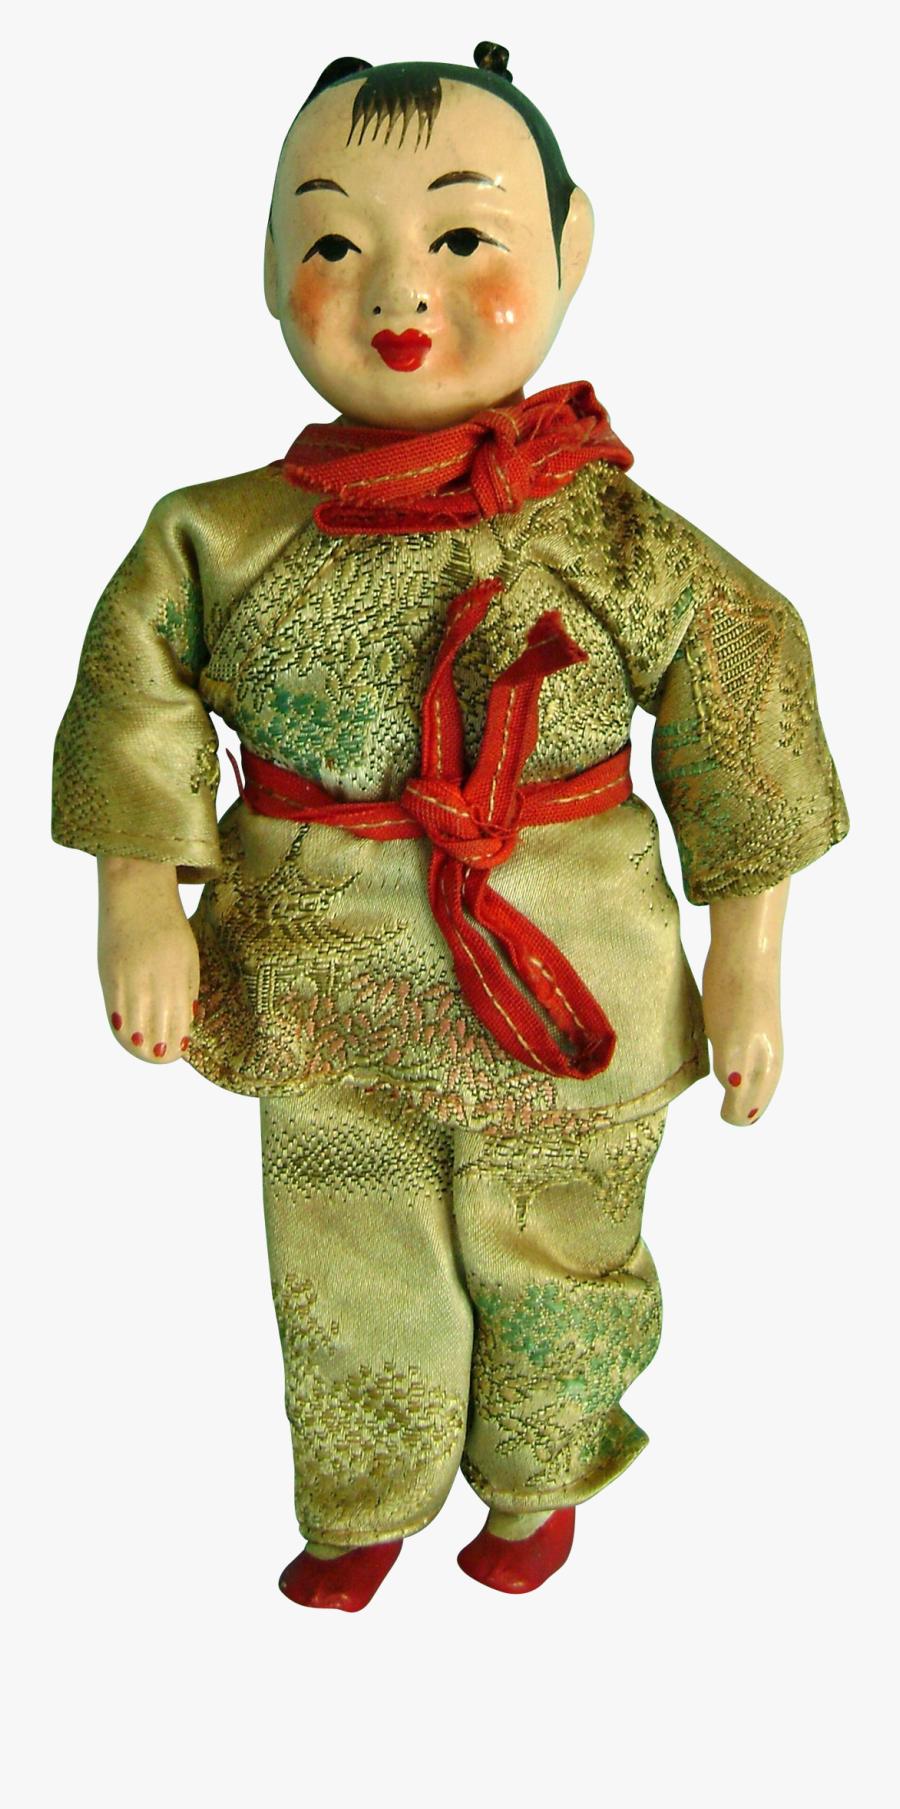 Vintage Antique Chinese Paper Papier Mache & Cloth - China Doll, Transparent Clipart